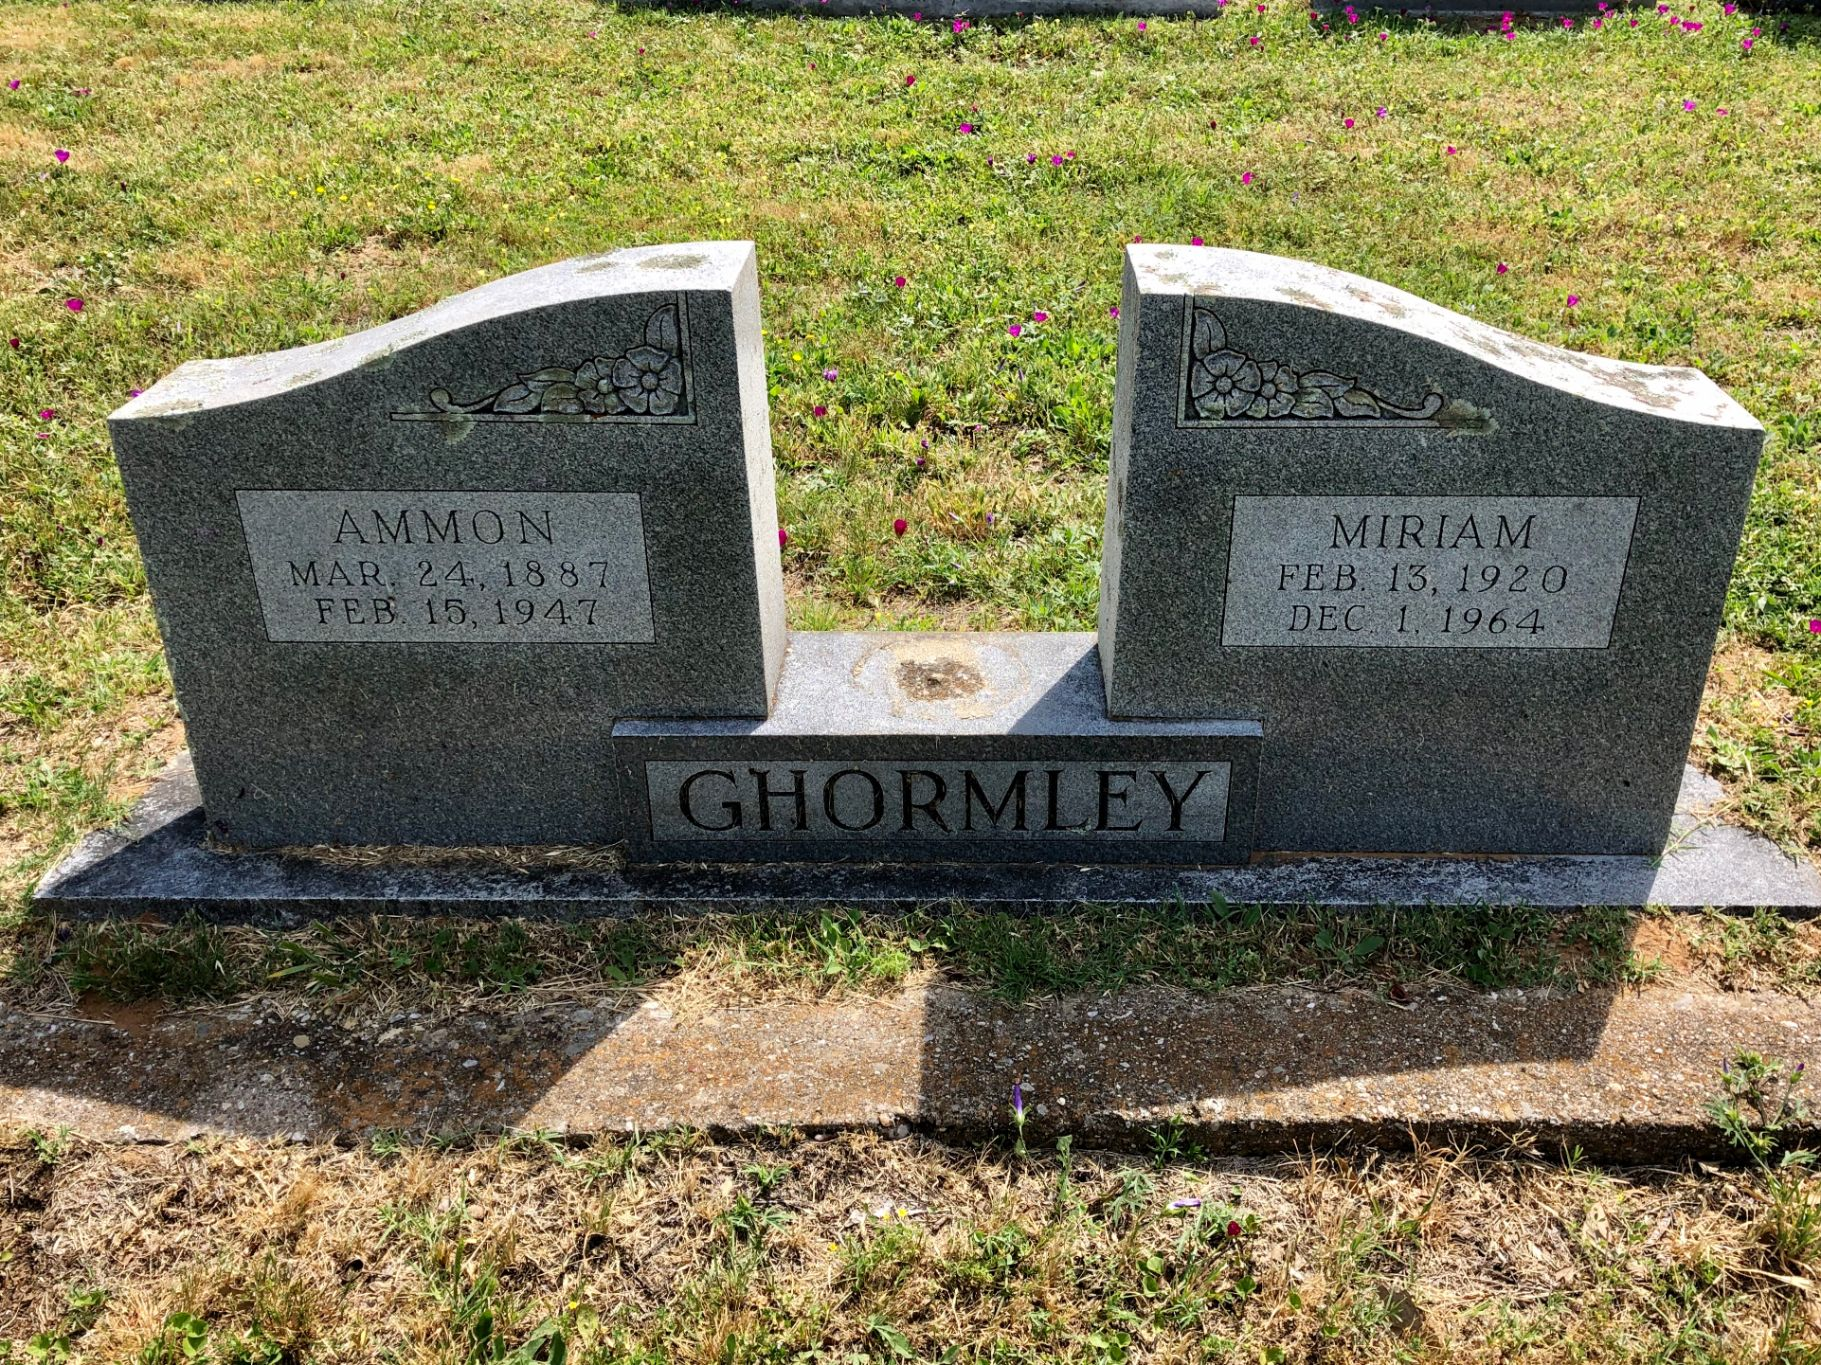 Ghormley